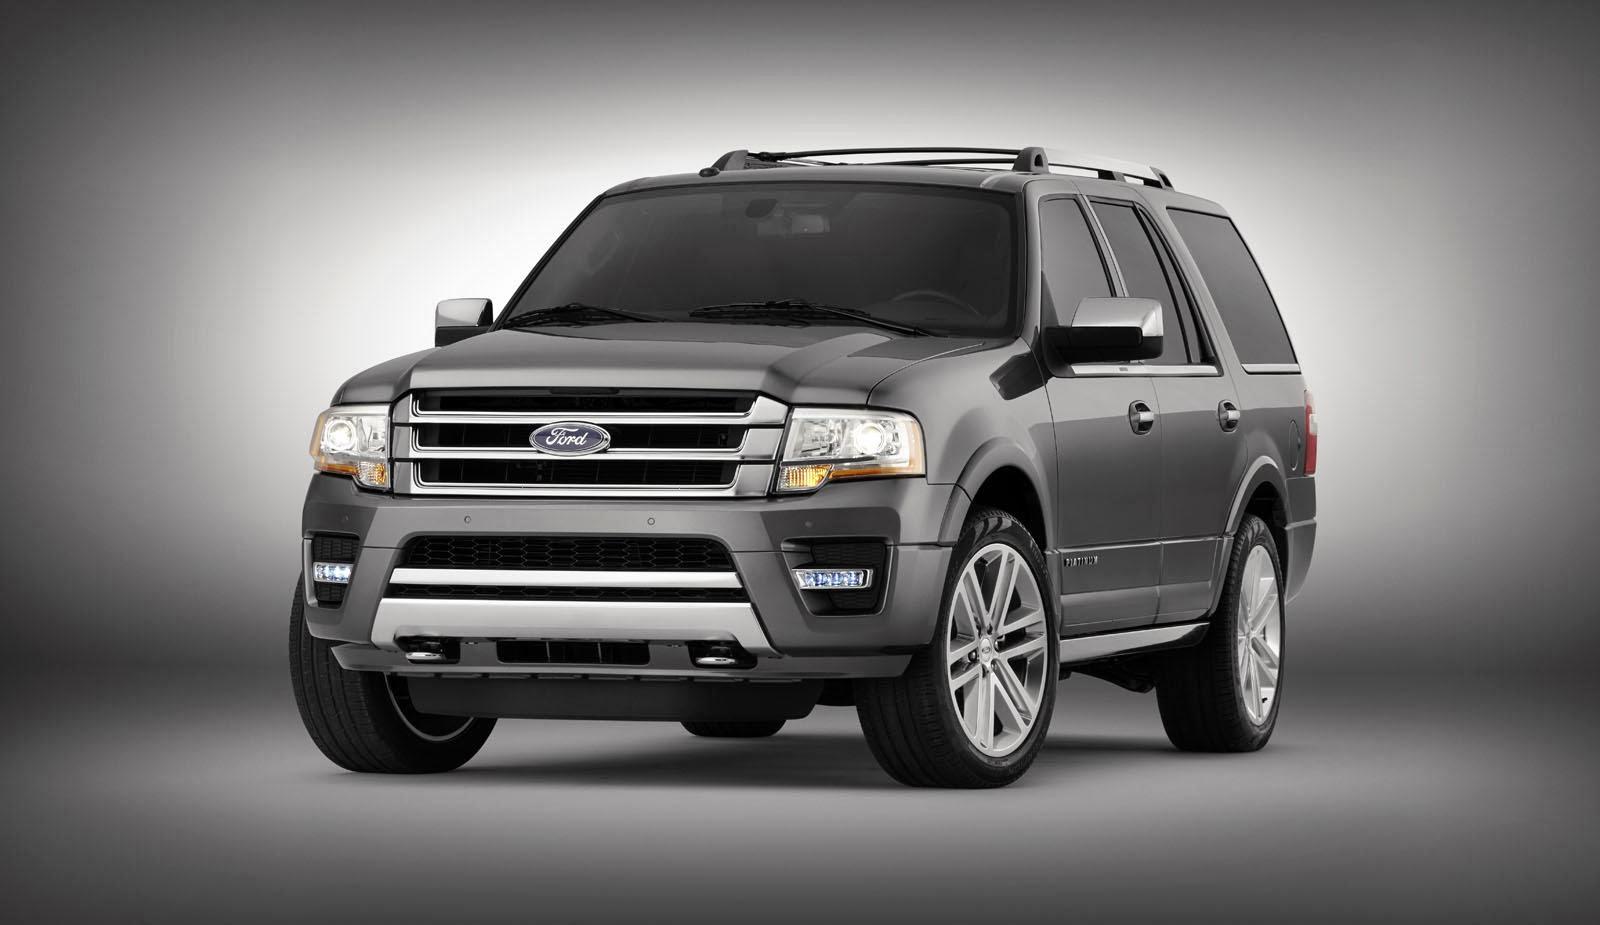 [Resim: Ford+Expedition+1.jpg]